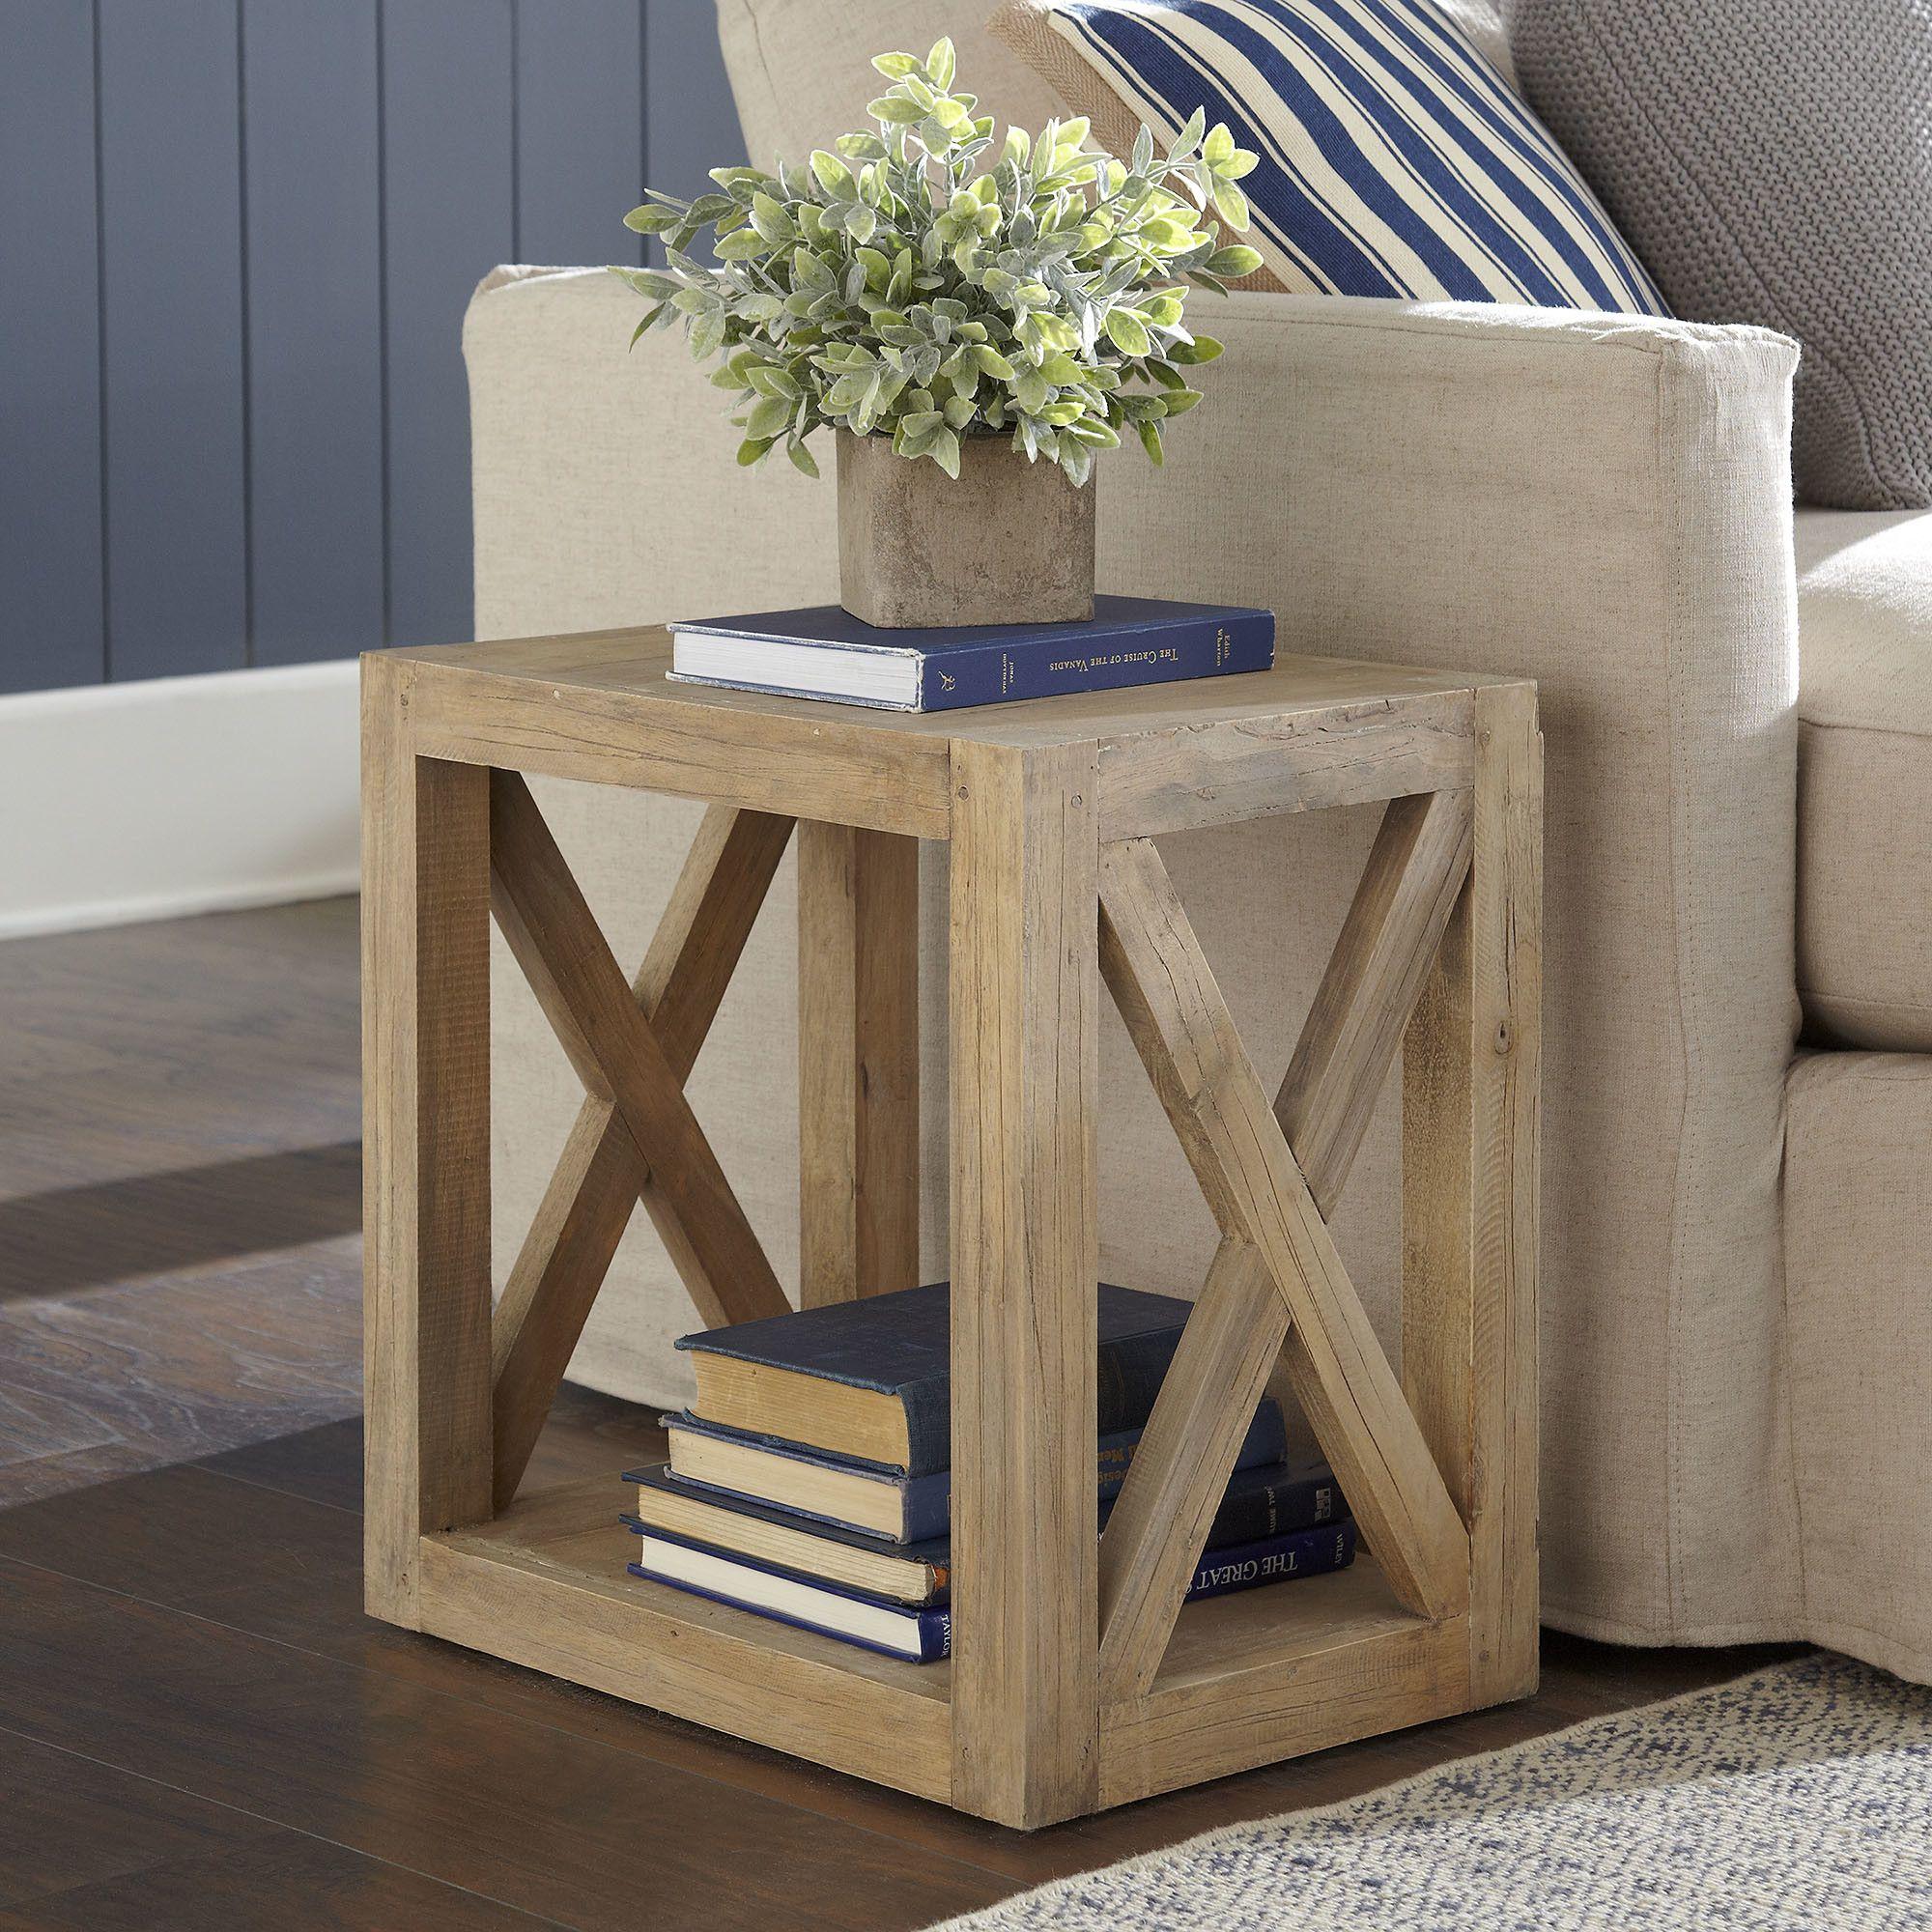 Wrightstown Solid Wood Floor Shelf End Table Diy Furniture Decor Diy Decor